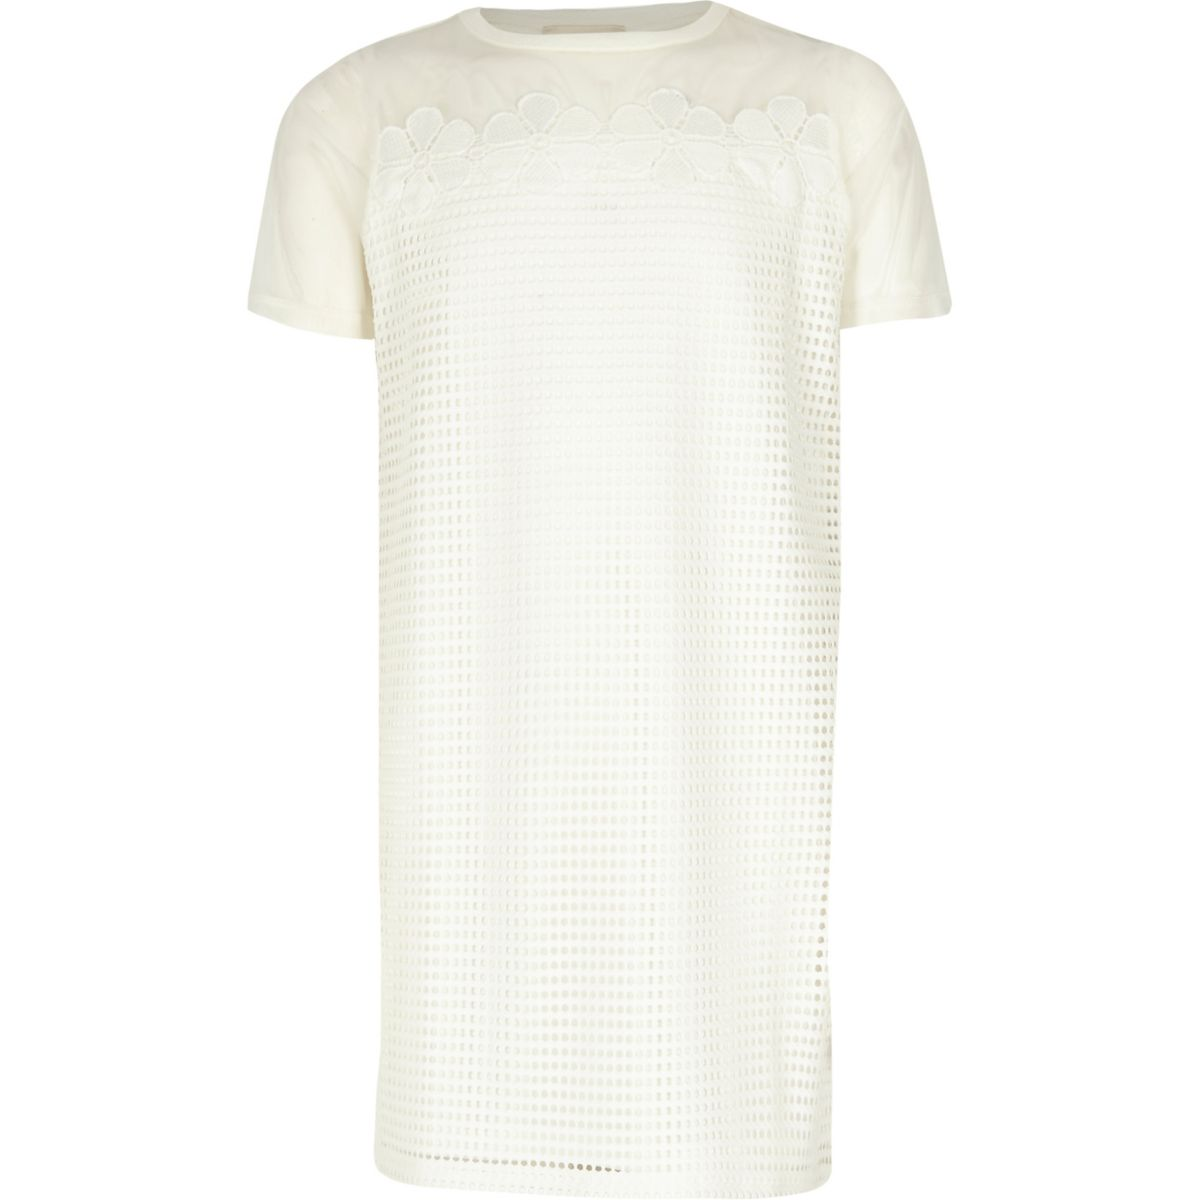 Girls white mesh T-shirt dress